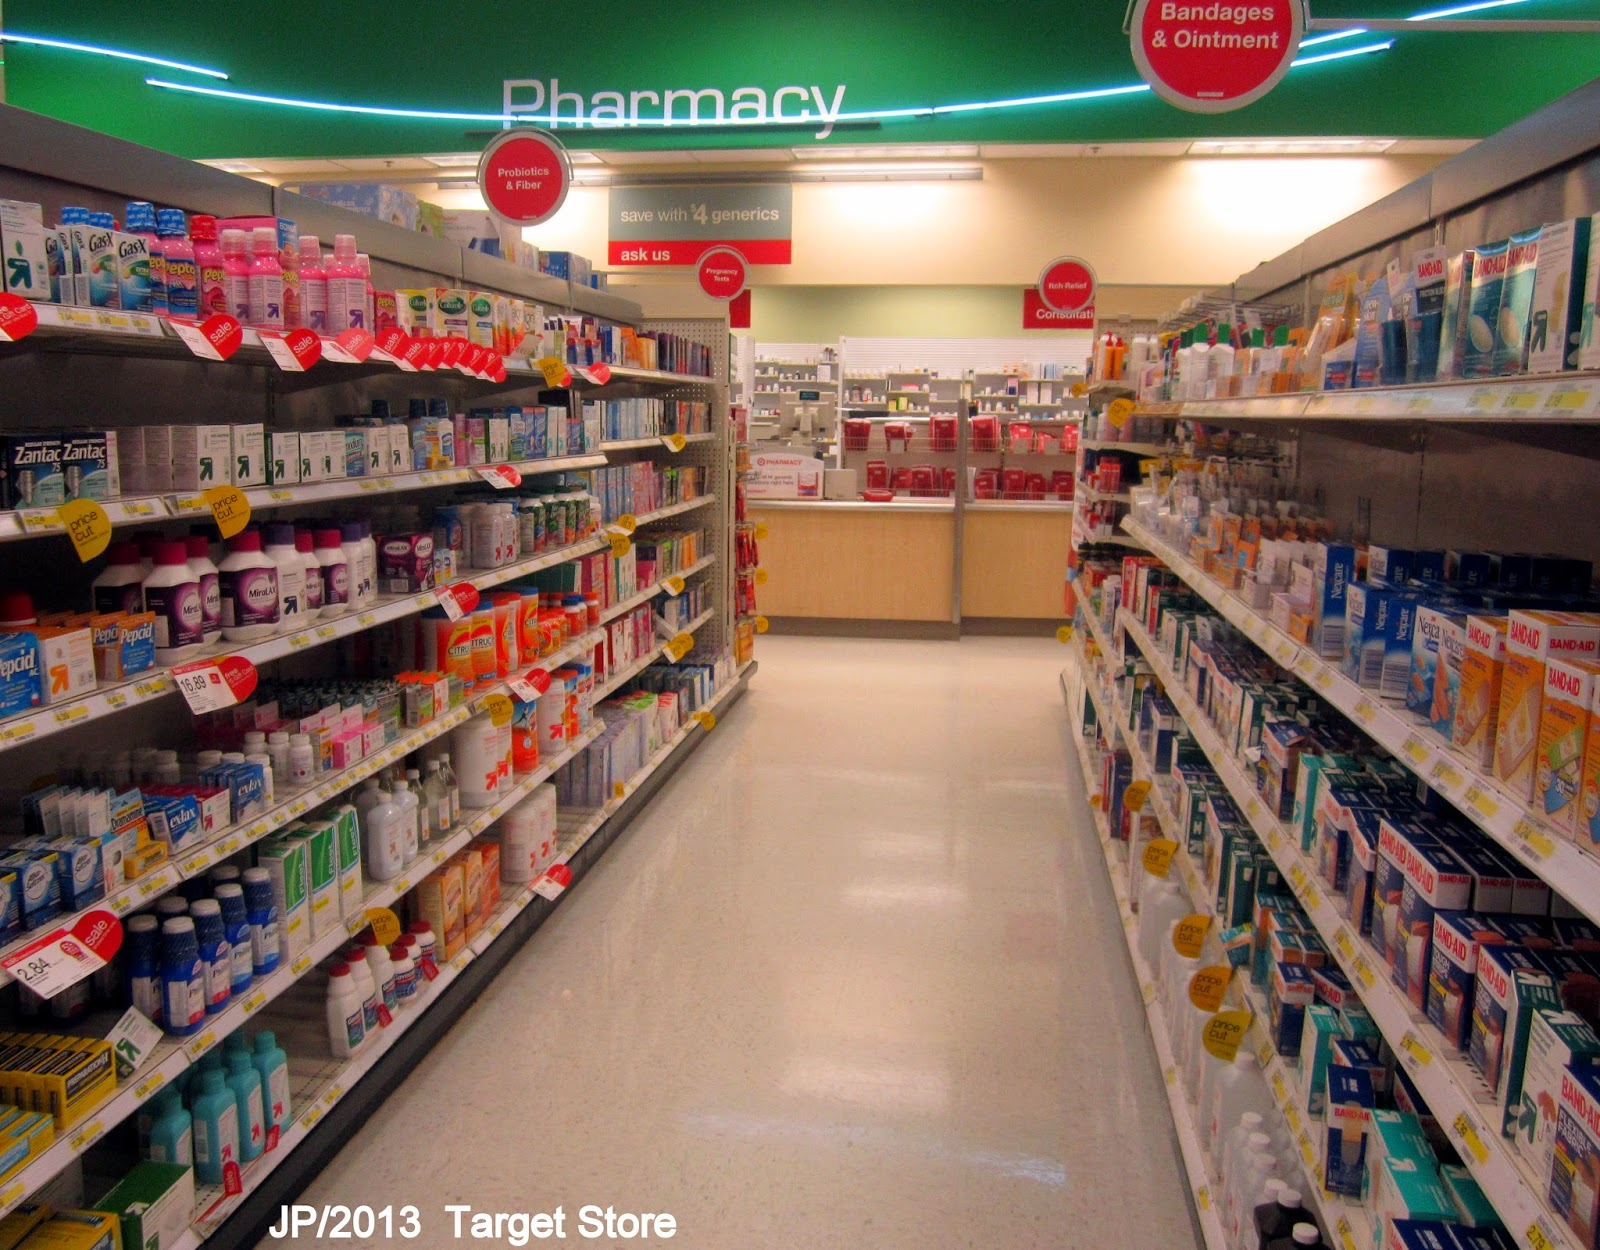 Furniture stores panama city beach fl - Target Pharmacy Drug Store Counter Aisles Target Store Pharmacy Drug Department Target Store At Pier Park Panama City Beach Florida